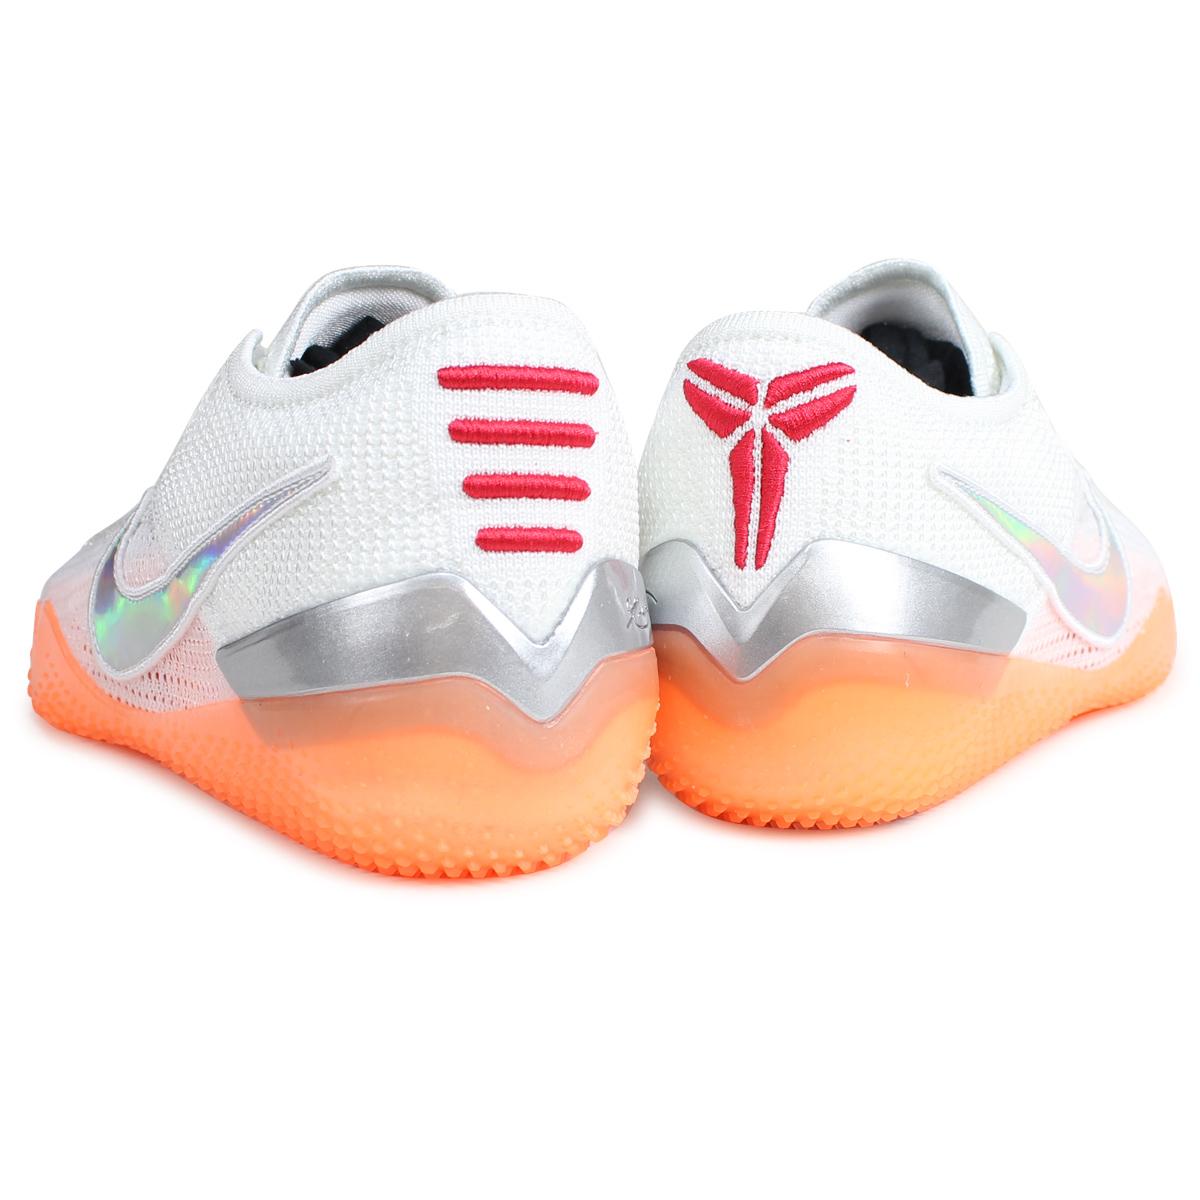 b3d9929ce783 ALLSPORTS  NIKE KOBE AD NXT 360 Nike Corby sneakers men AQ1087-100 ...